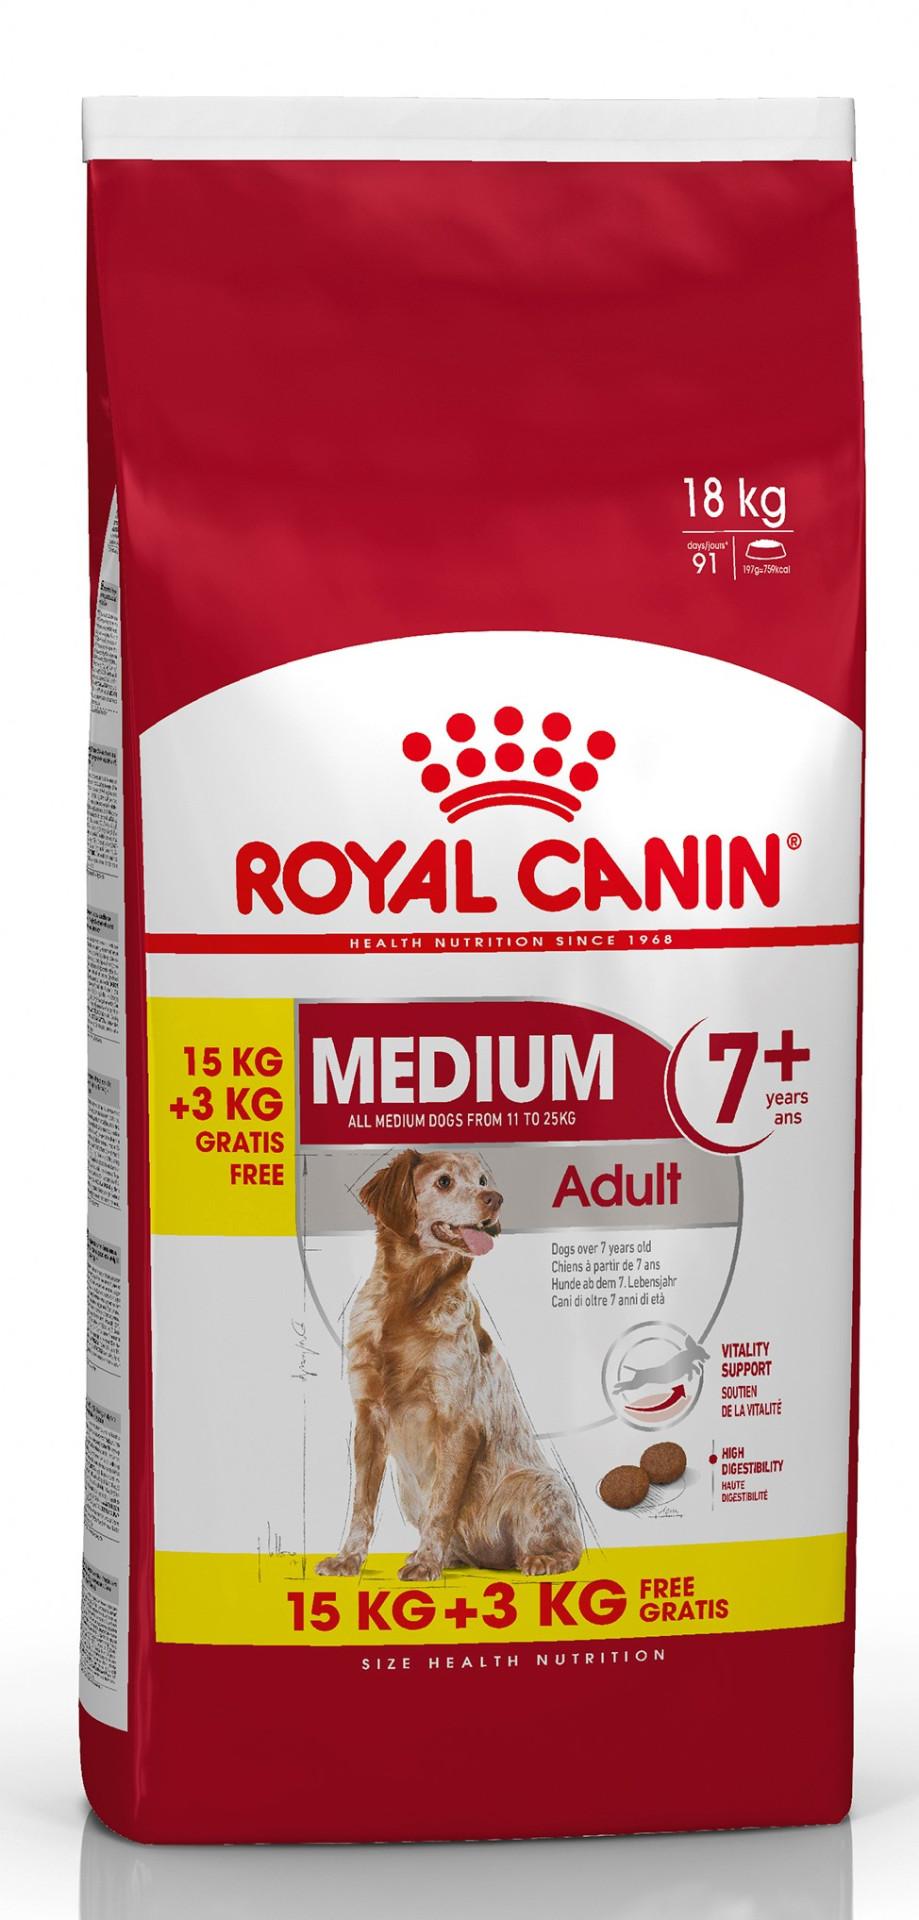 15 + 3 kg Royal Canin hondenvoer Medium Adult 7+